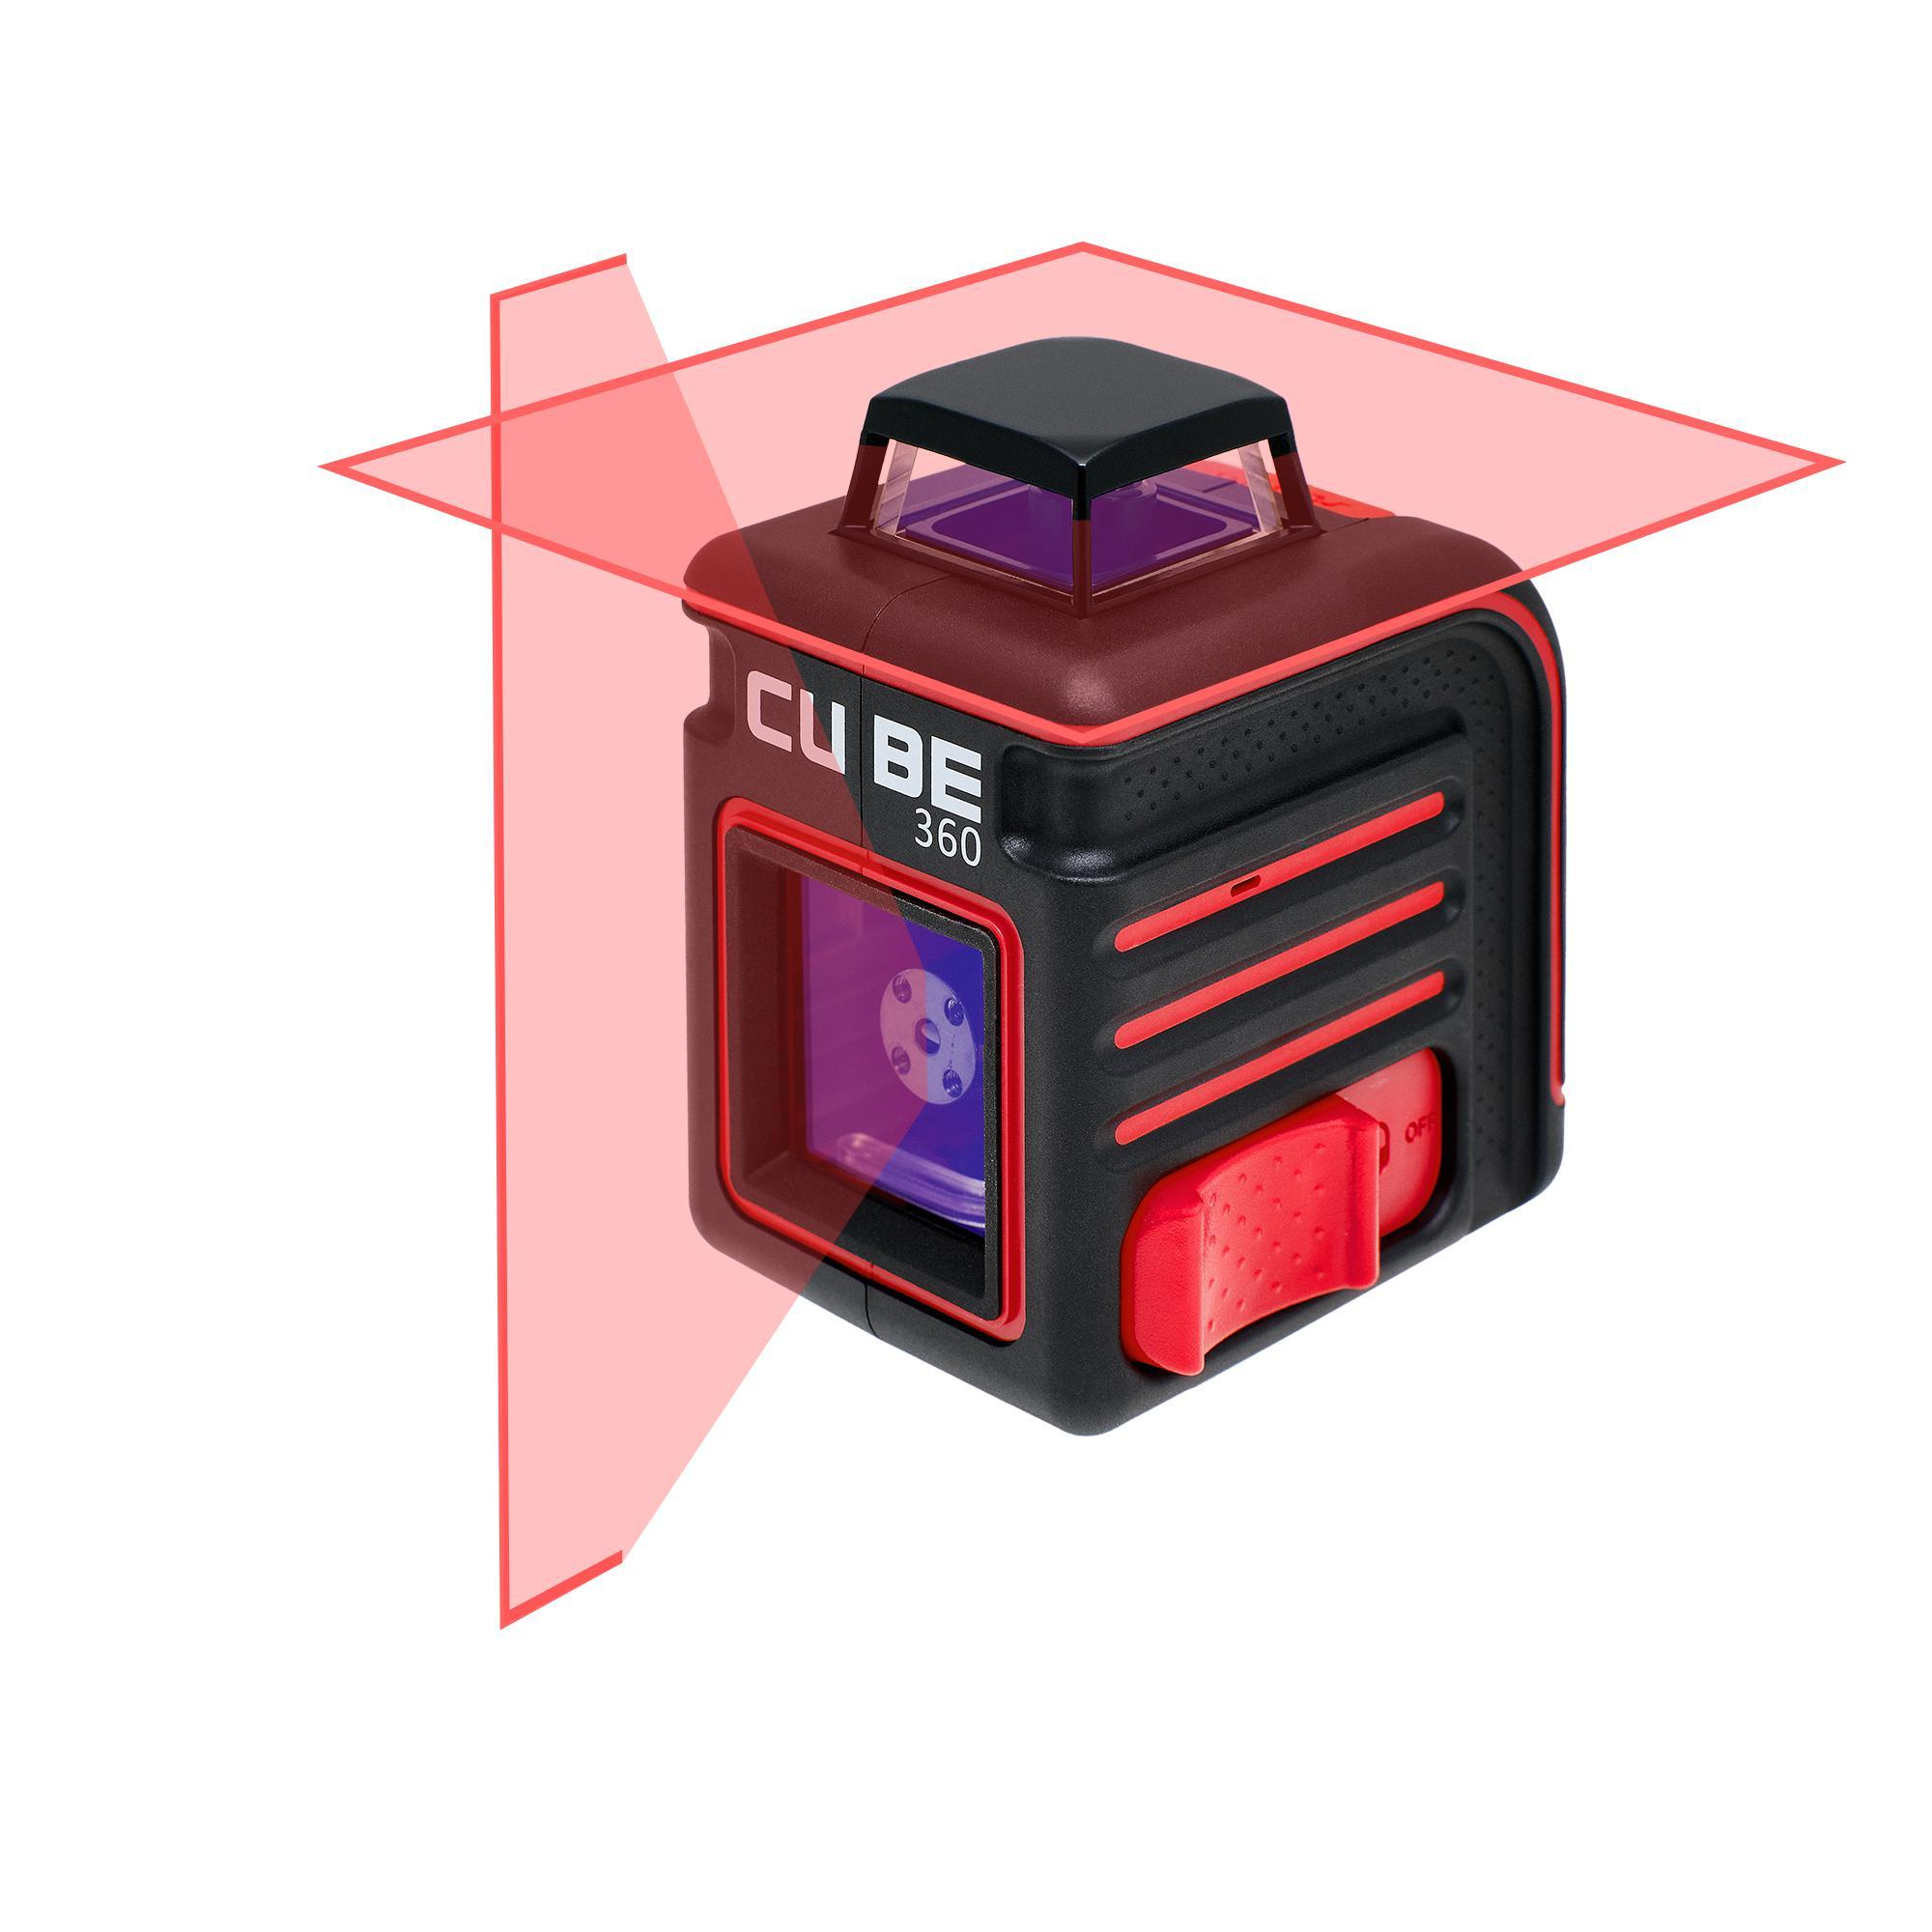 все цены на Уровень Ada Cube 360 basic edition онлайн